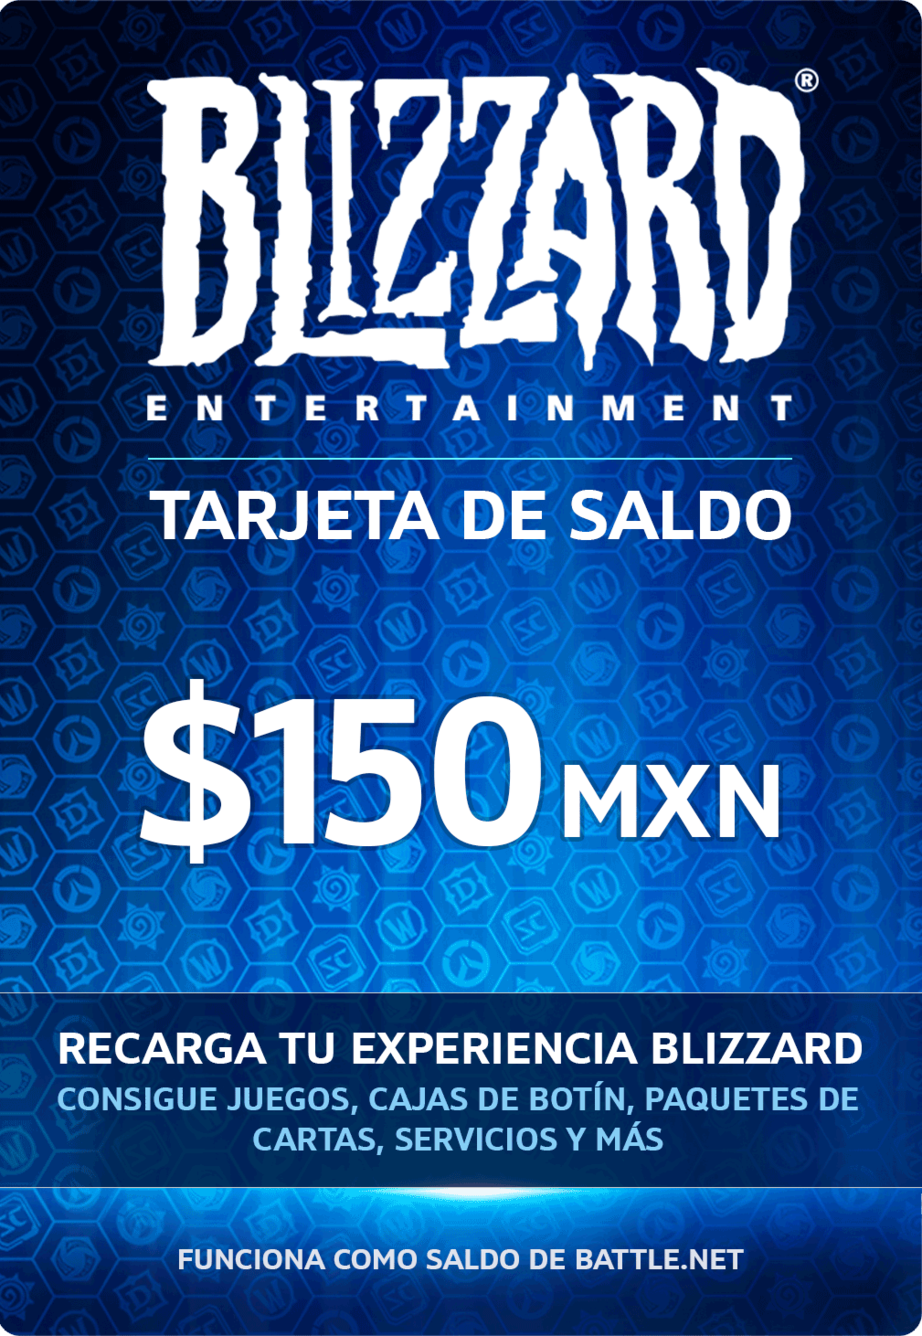 Blizzard Tarjeta de saldo 150 MXN